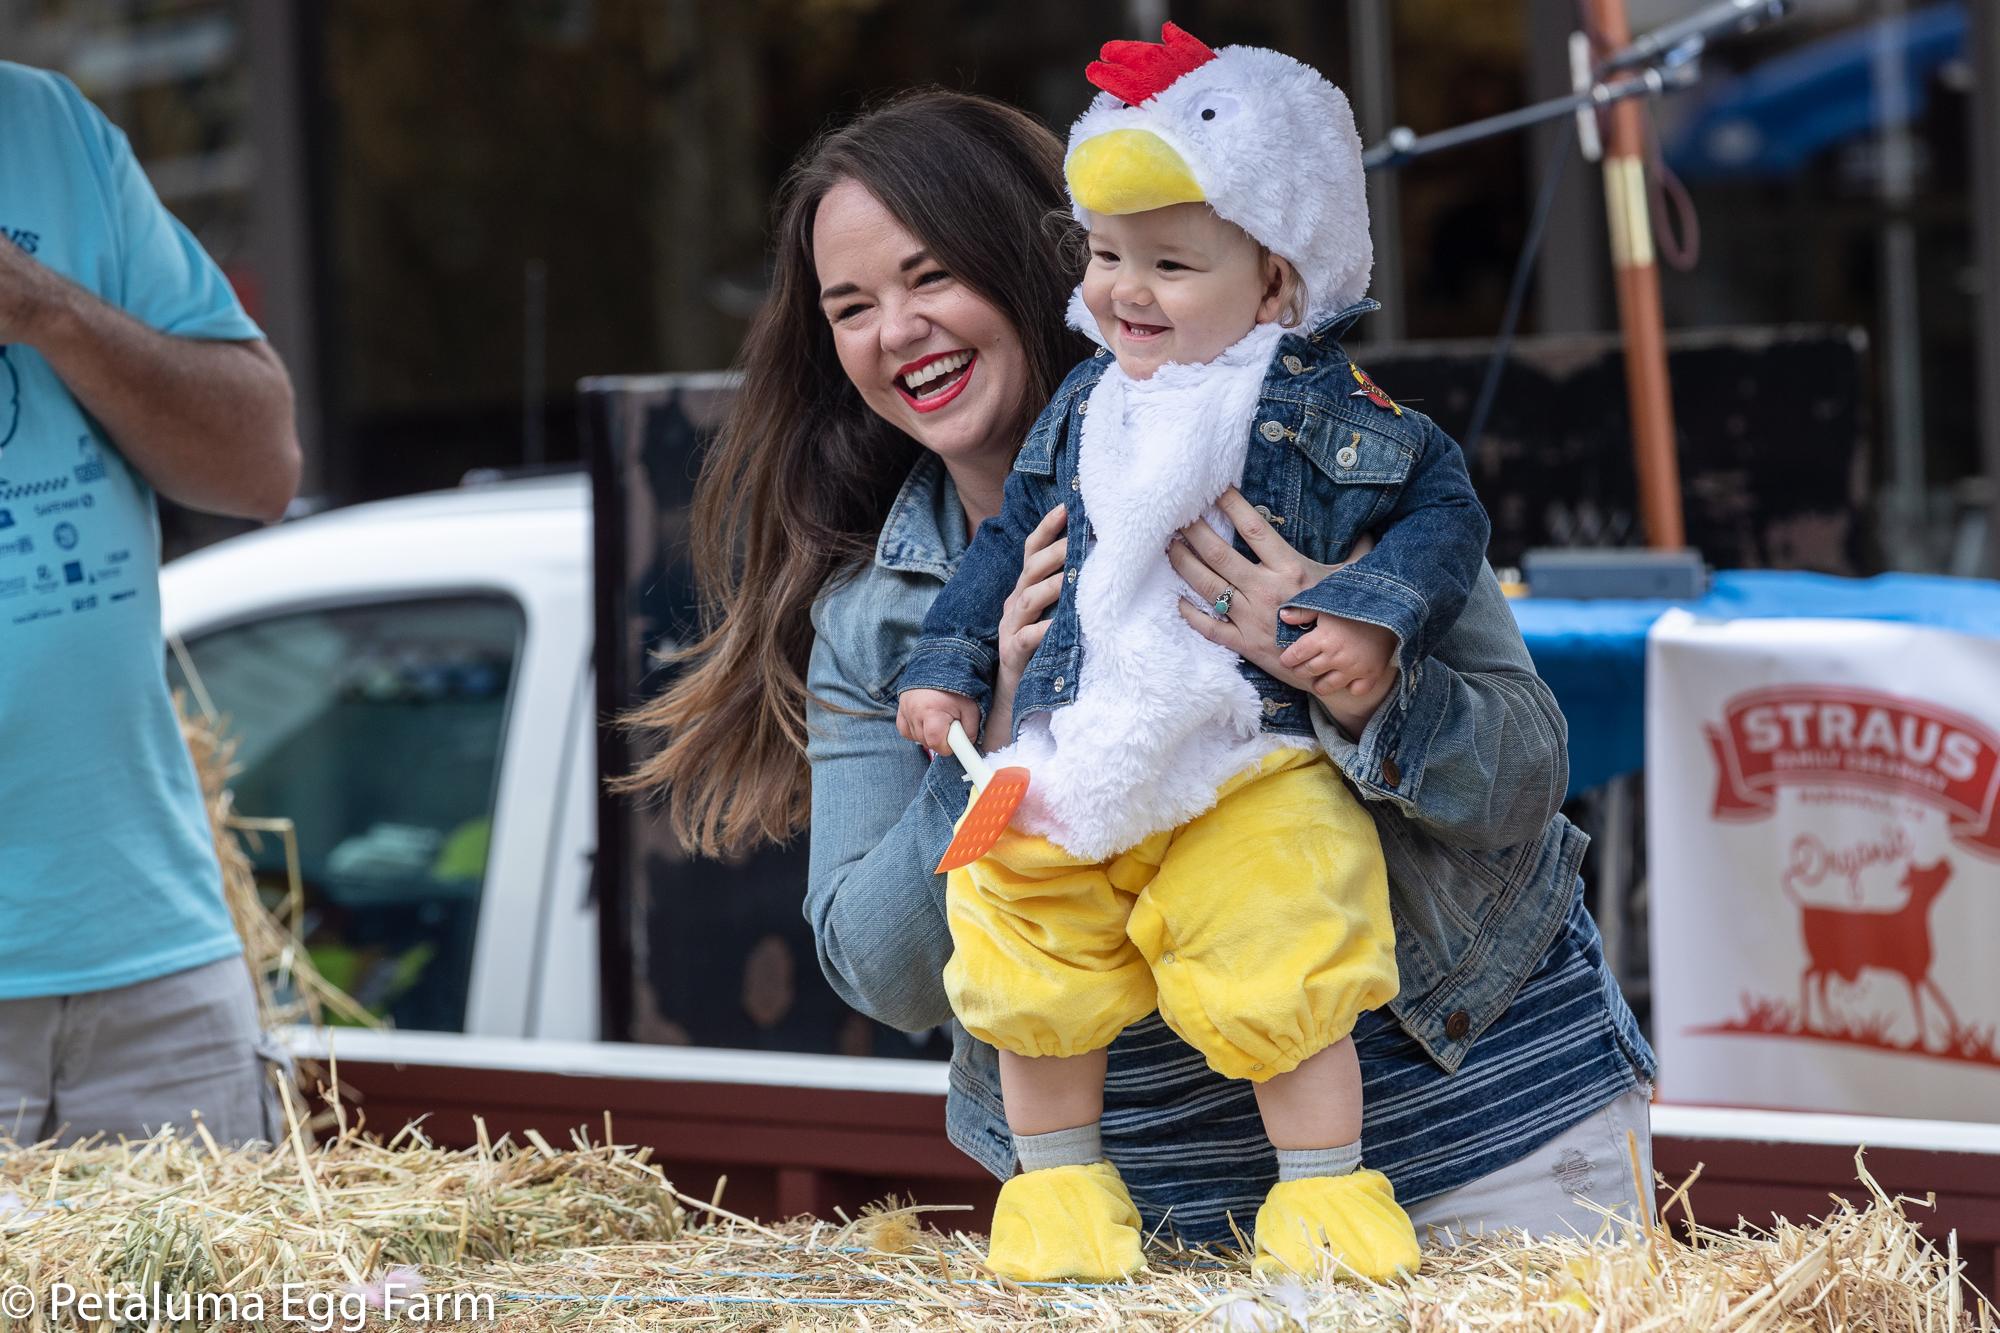 cutest chick 2018 - 2000px-4074.jpg